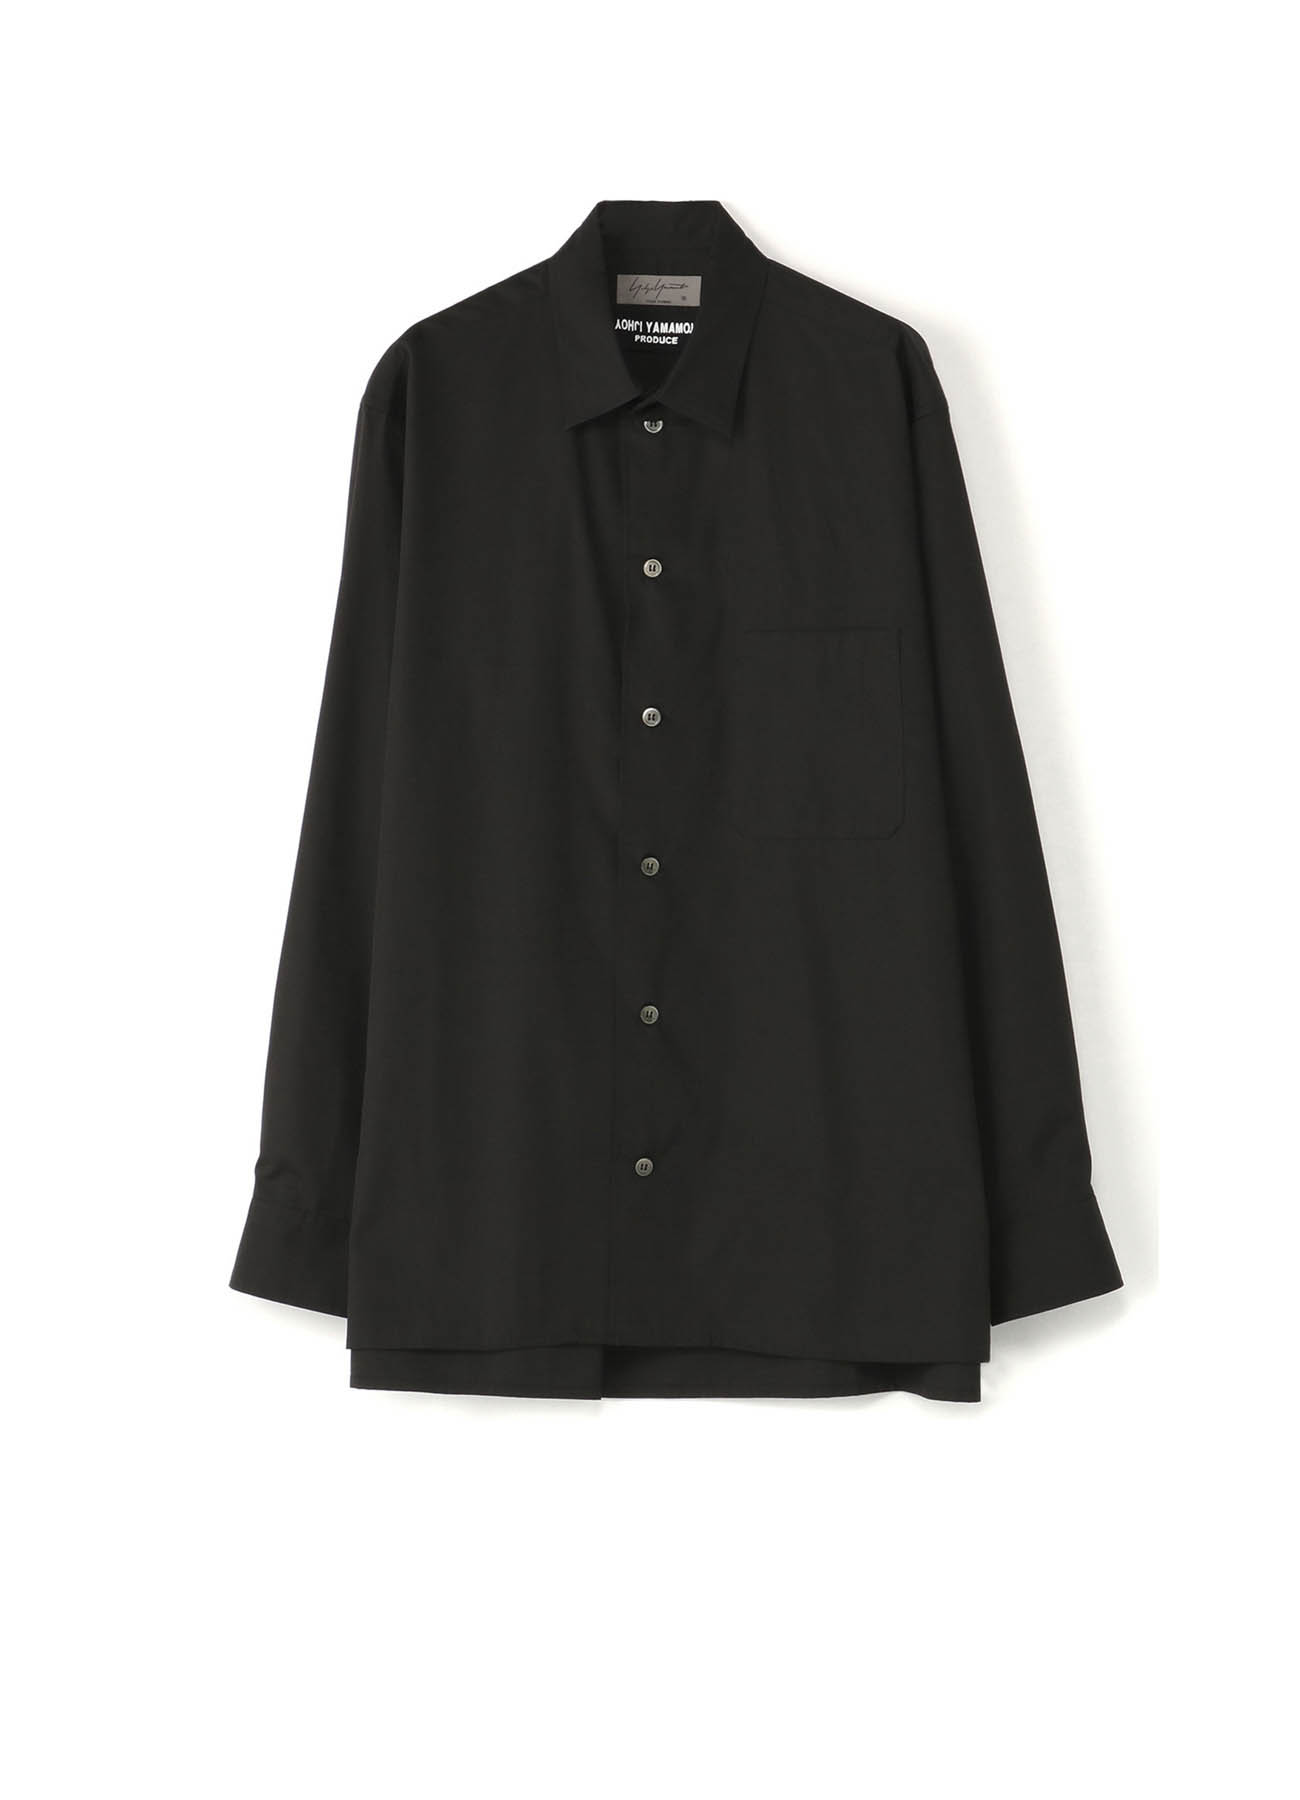 【THE SHOP限定】细平纹衬衫